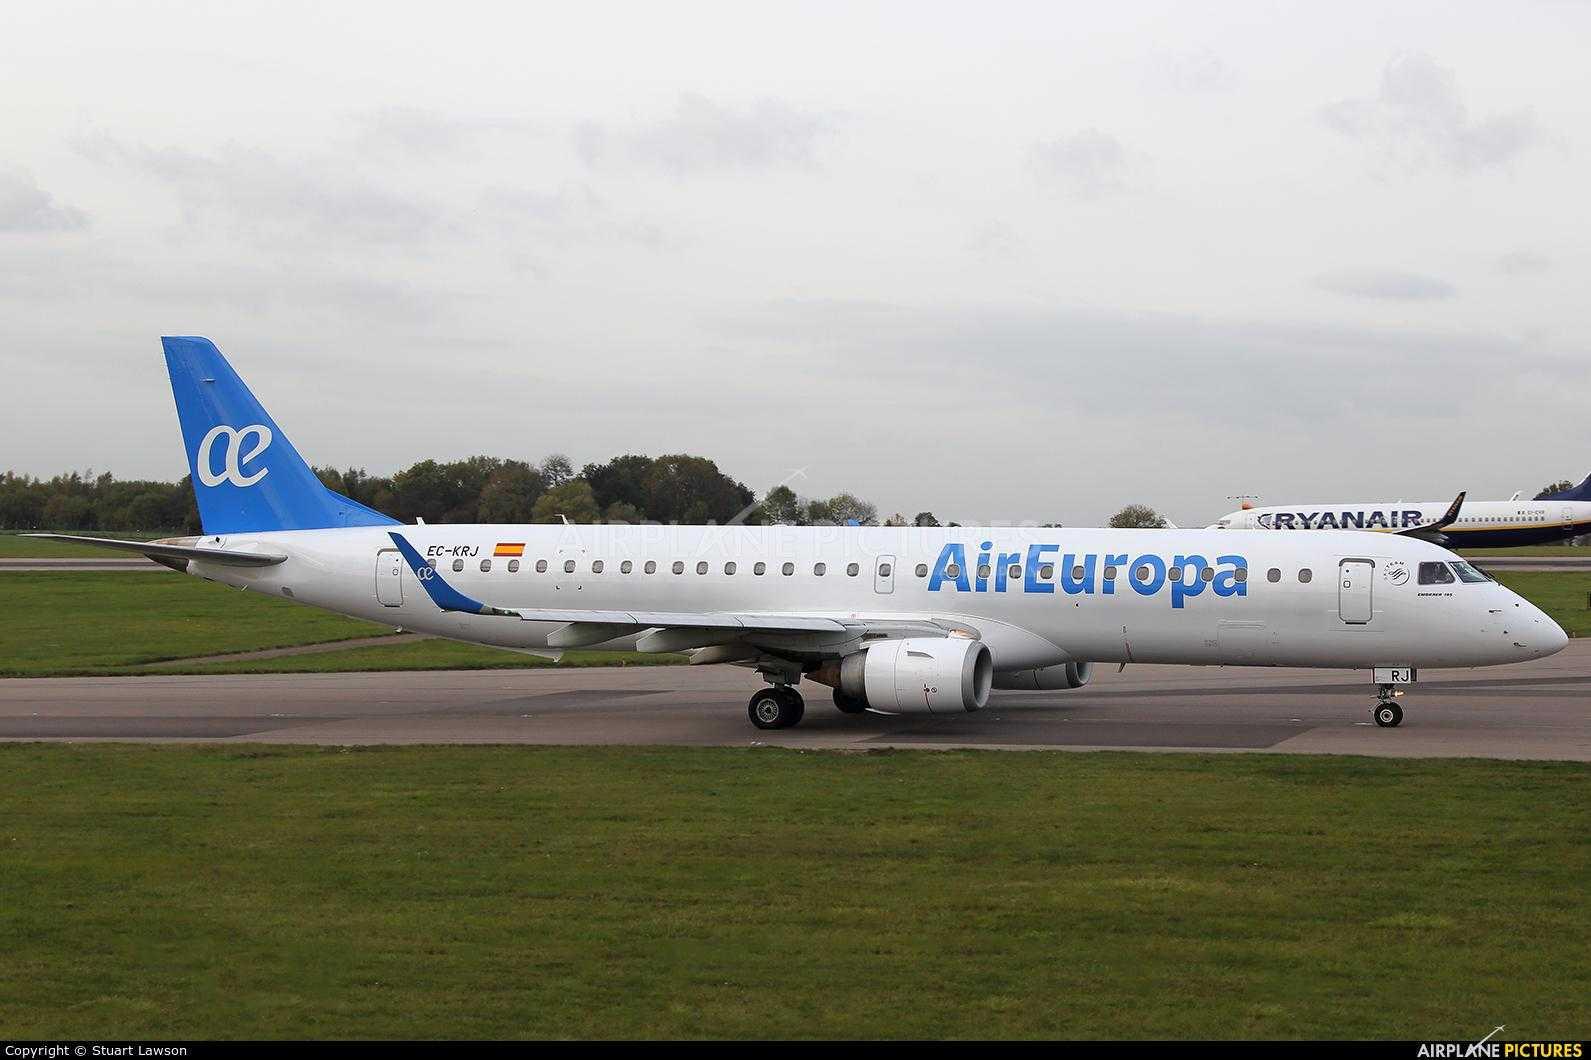 EC-KRJ-Embraer-Air-Europa-new-livery